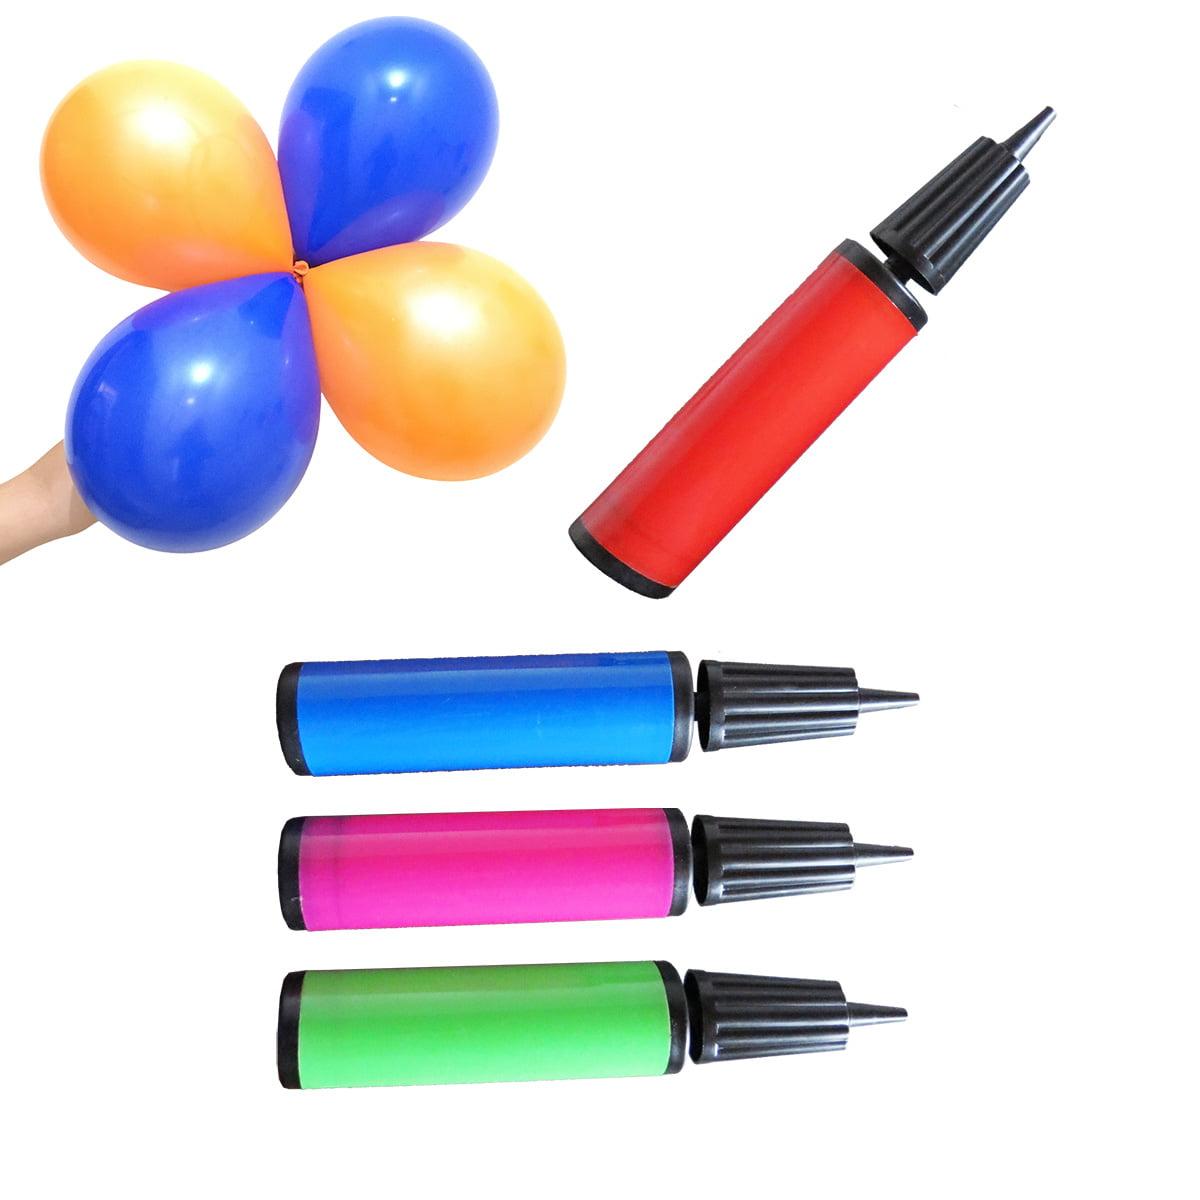 Bomba para Encher Balões